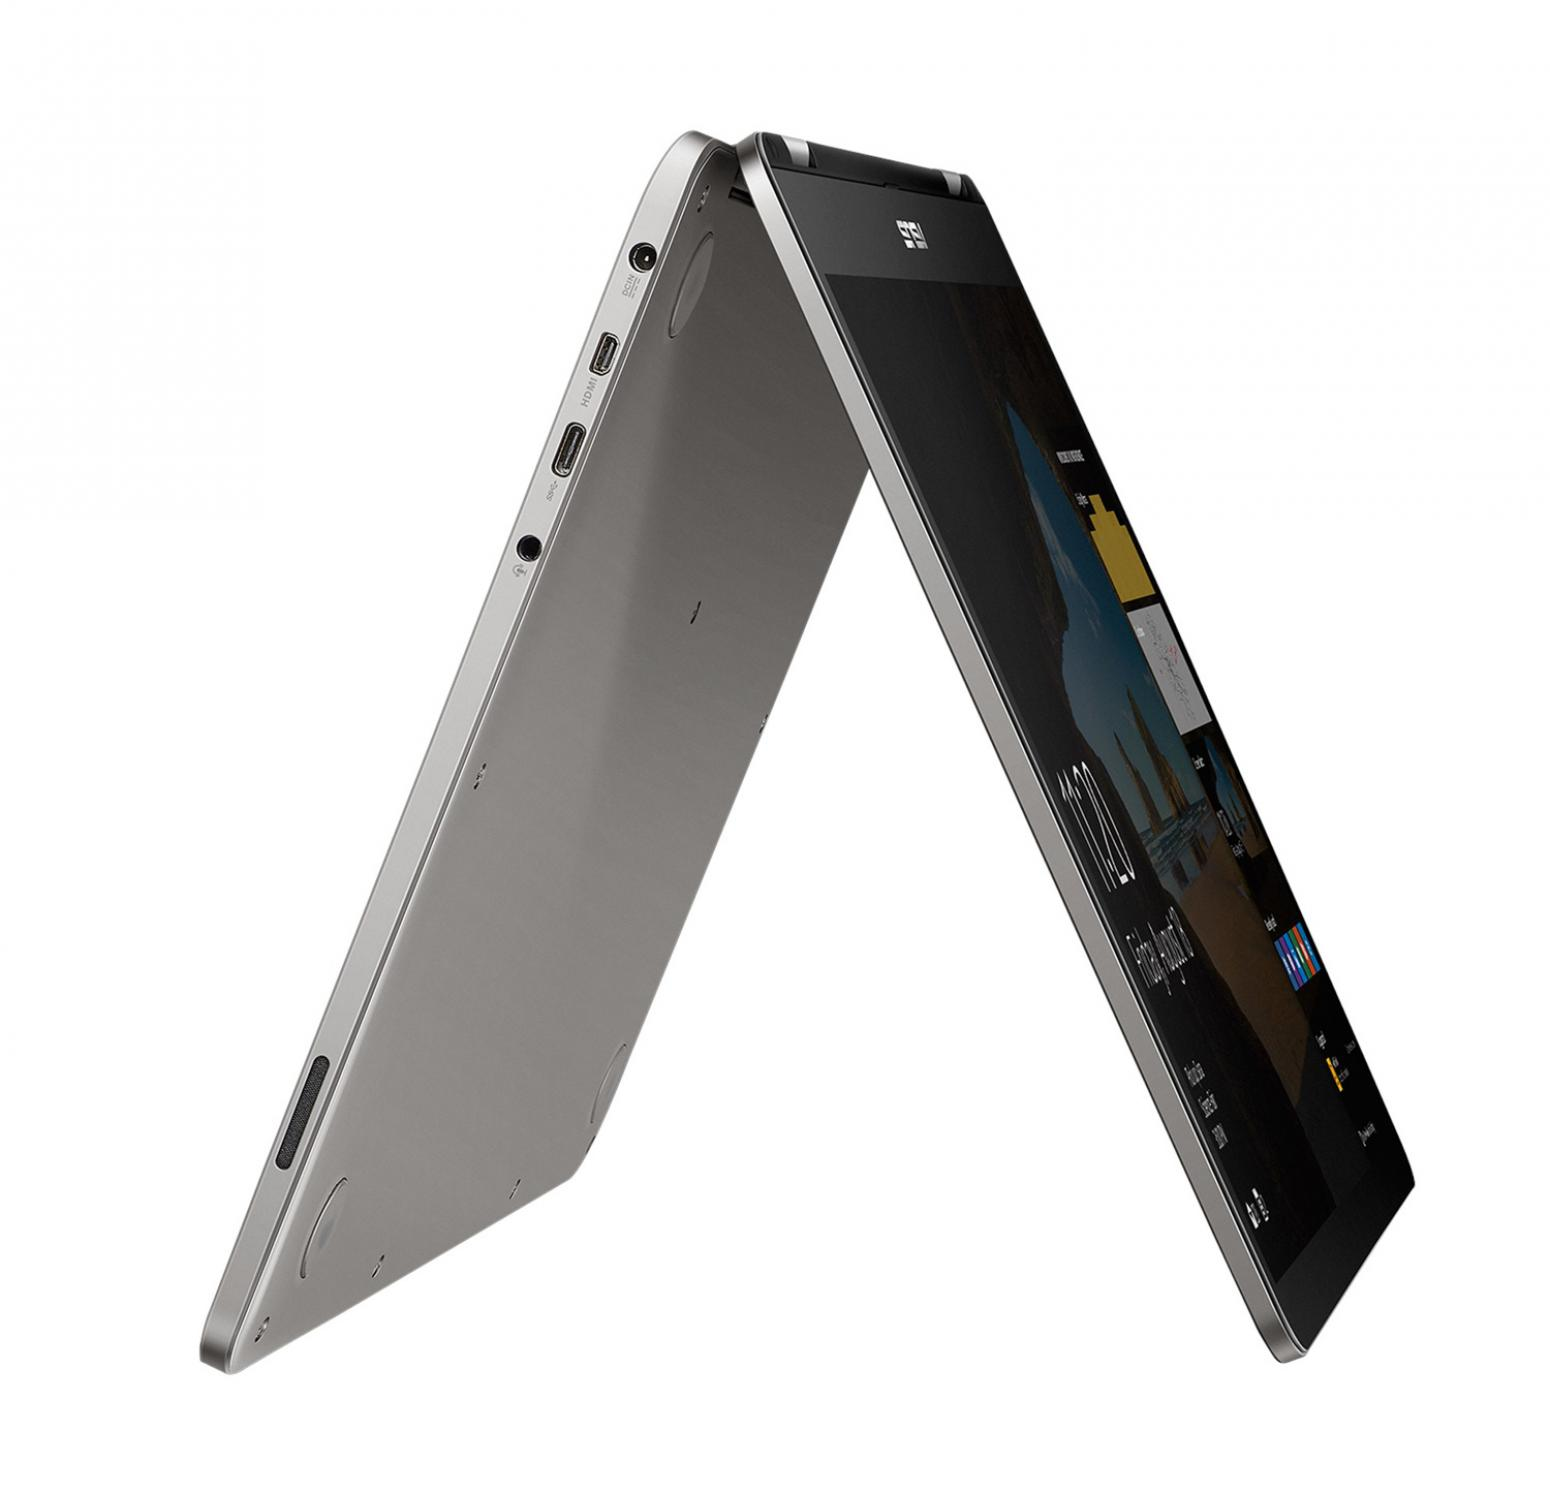 Ordinateur portable Asus VivoBook Flip J401NA-BZ060TS tactile - photo 2